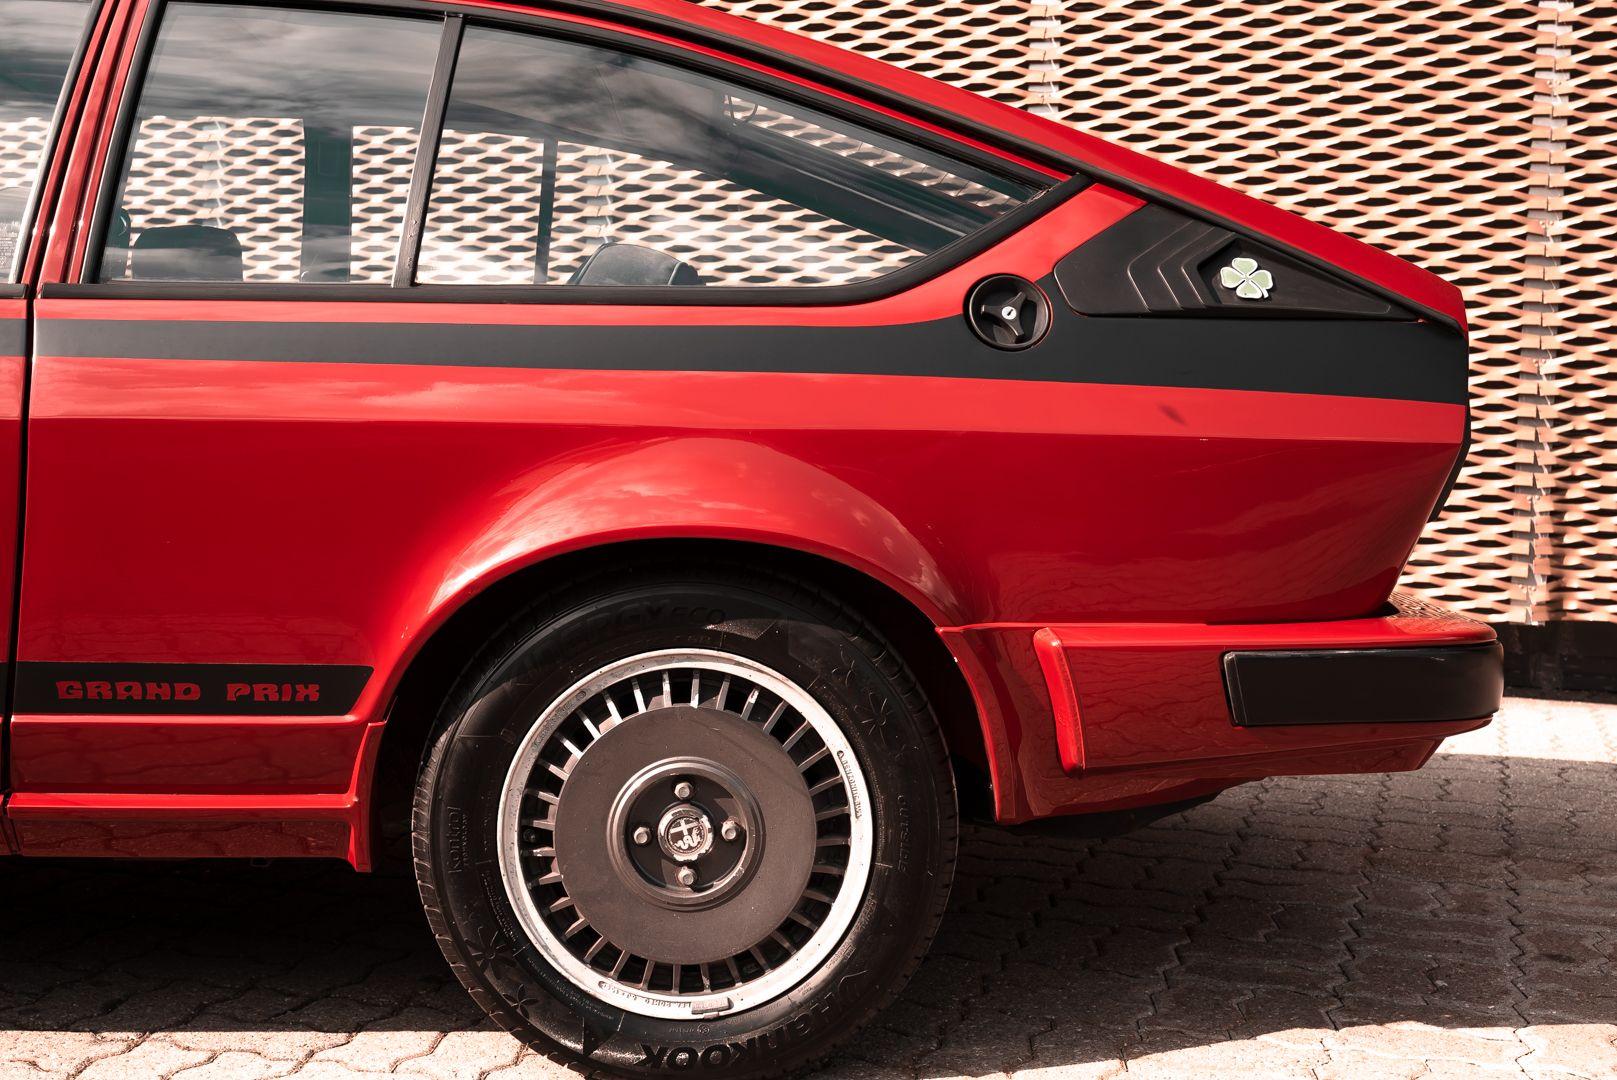 1981 Alfa Romeo Alfetta GTV Gran Prix n.128 68569